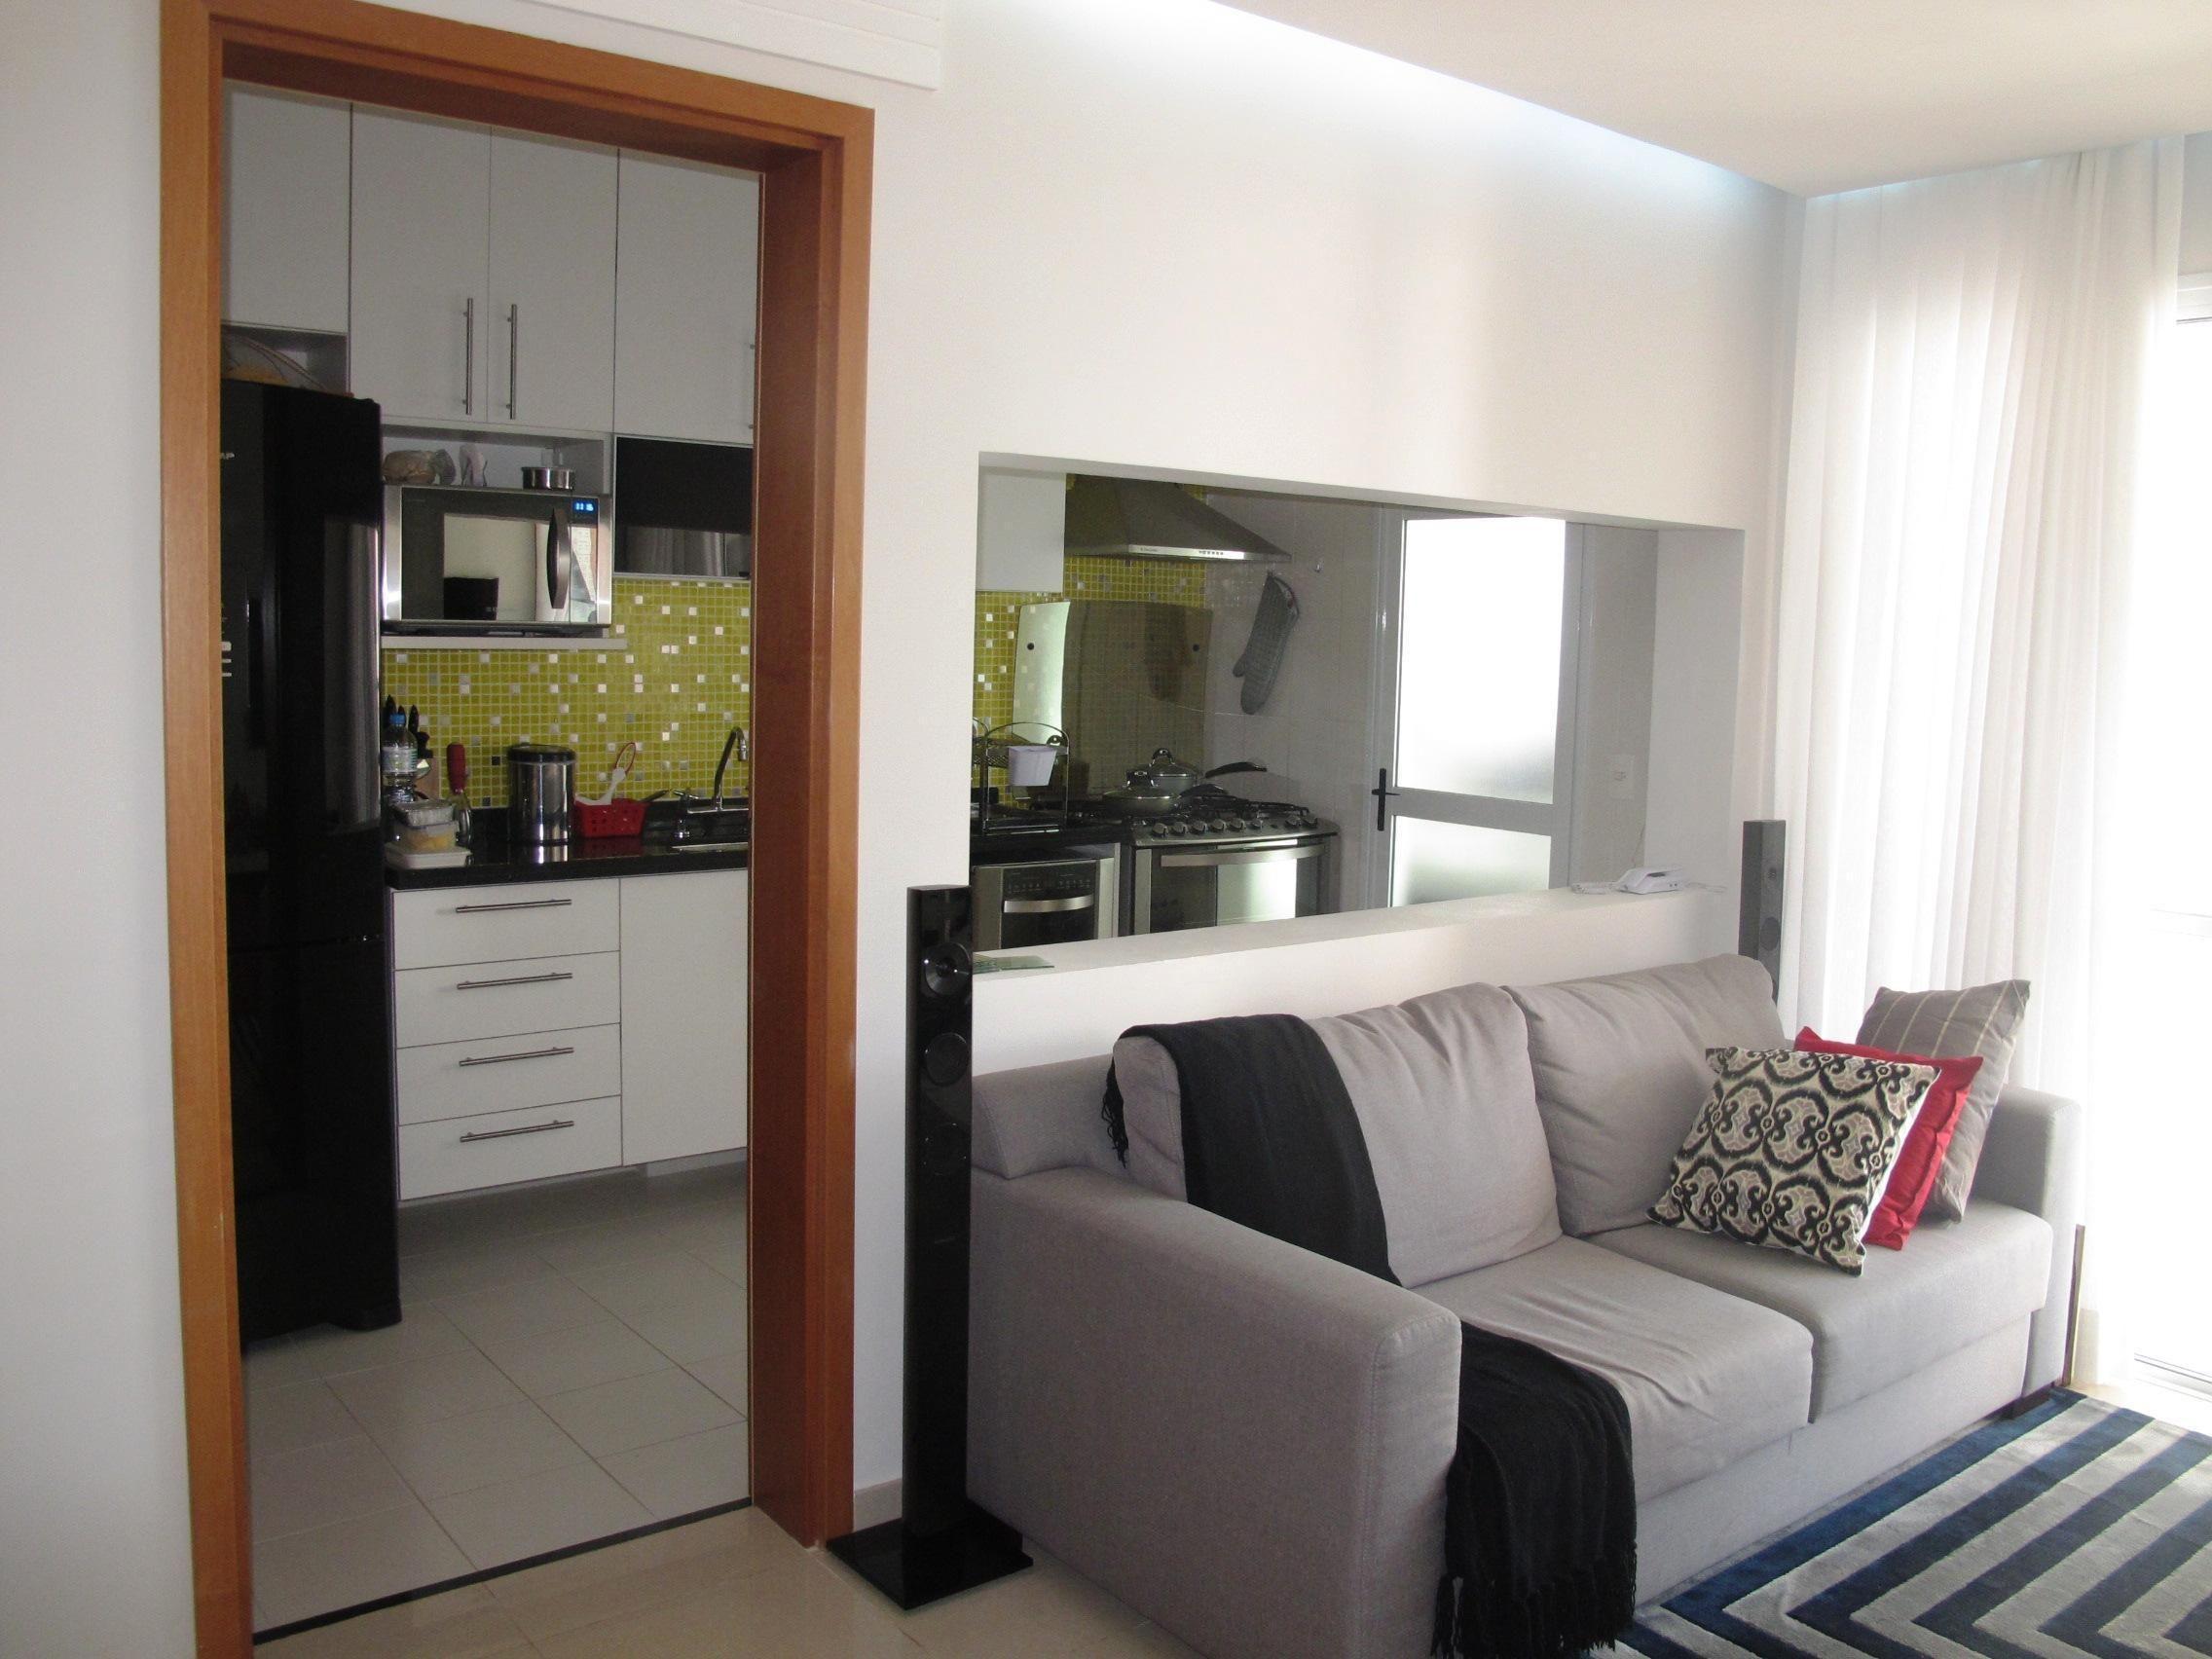 2066 cozinha apartamento morumbi battaglia arquitetura mariane  #684433 2272 1704